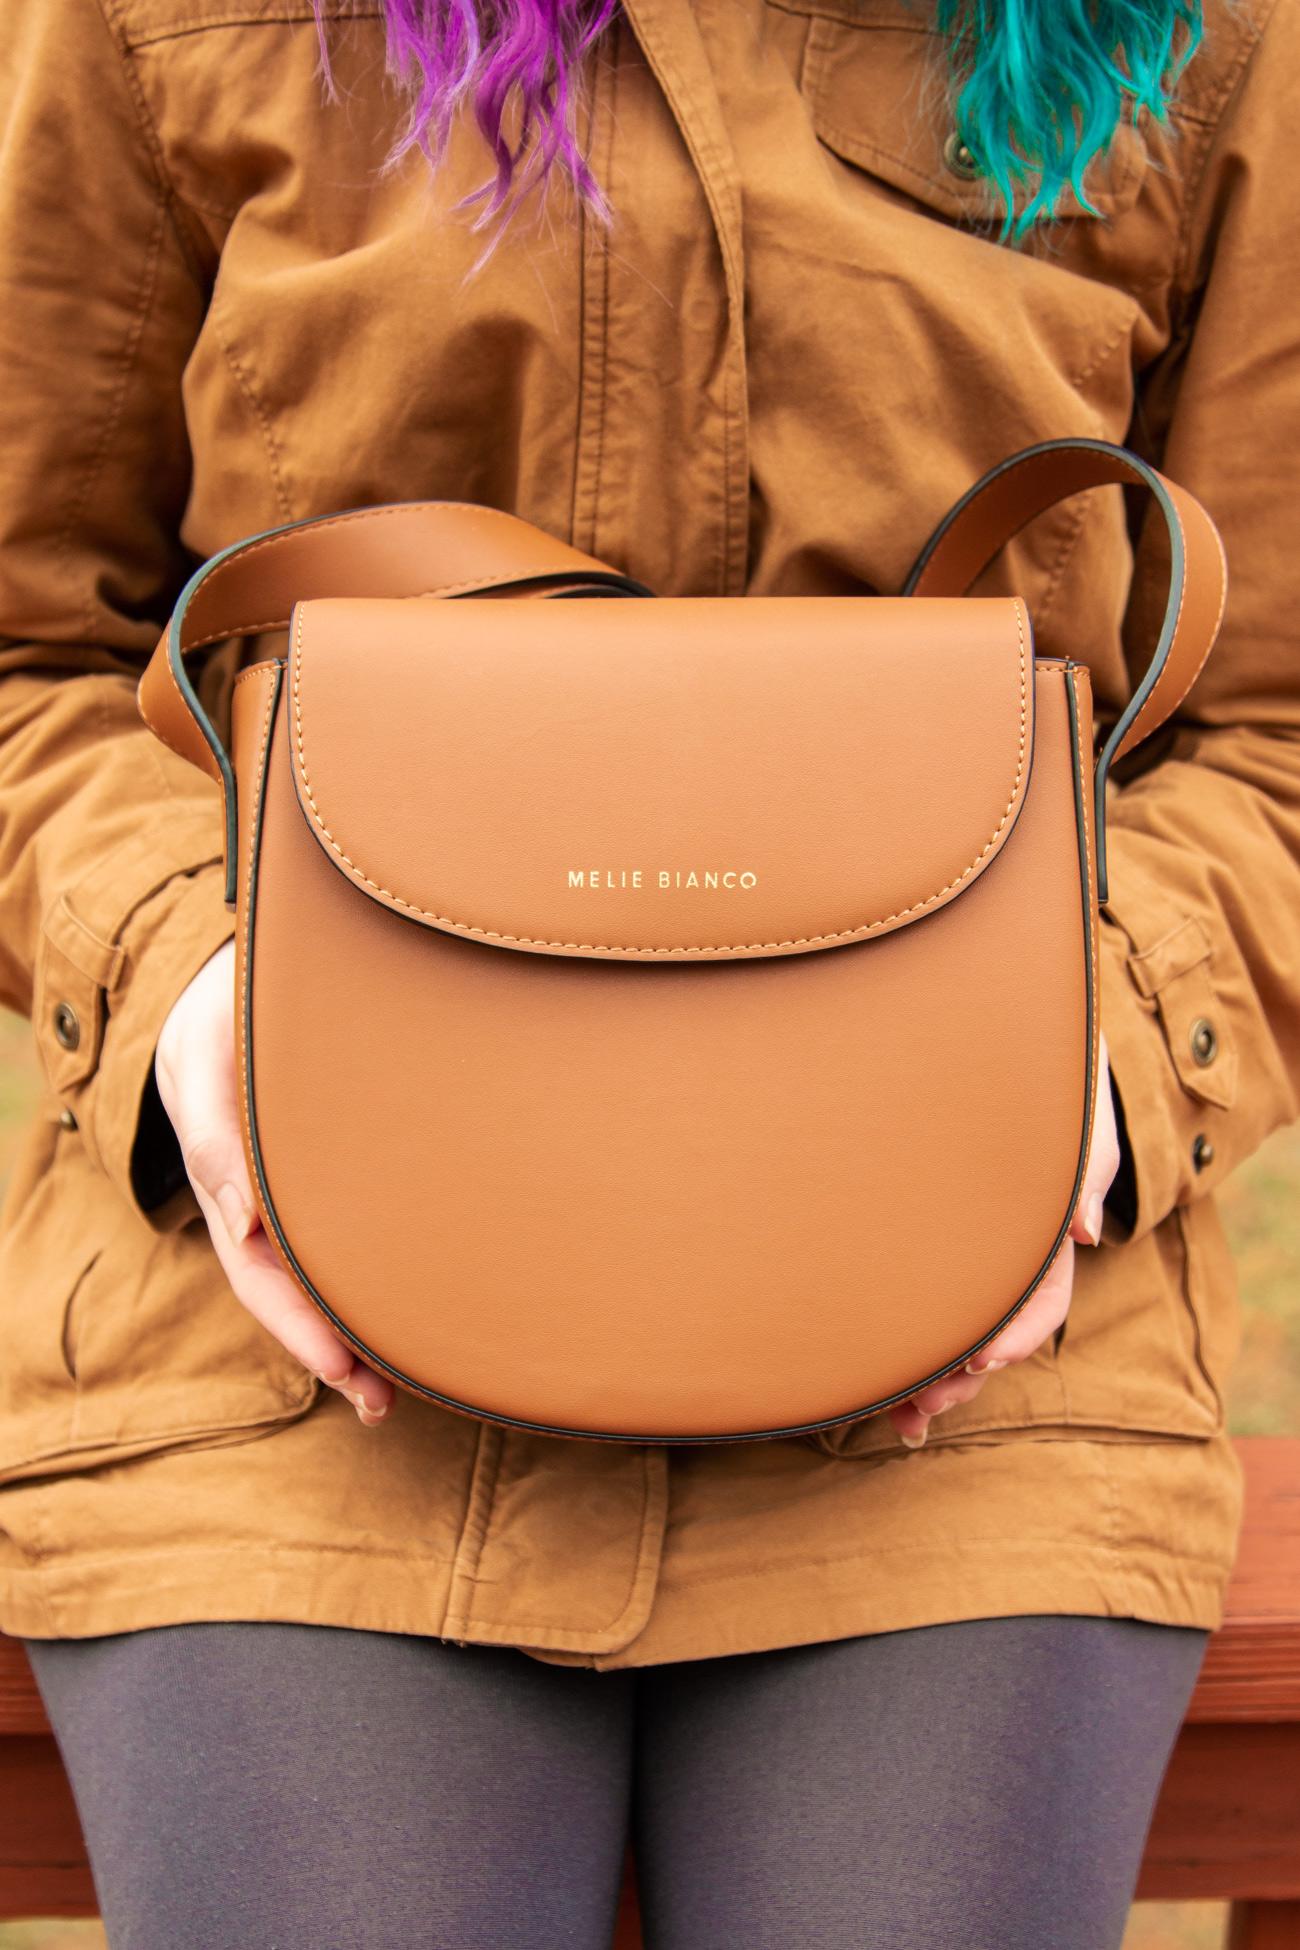 Vegan Leather Handbag Cruelty Free